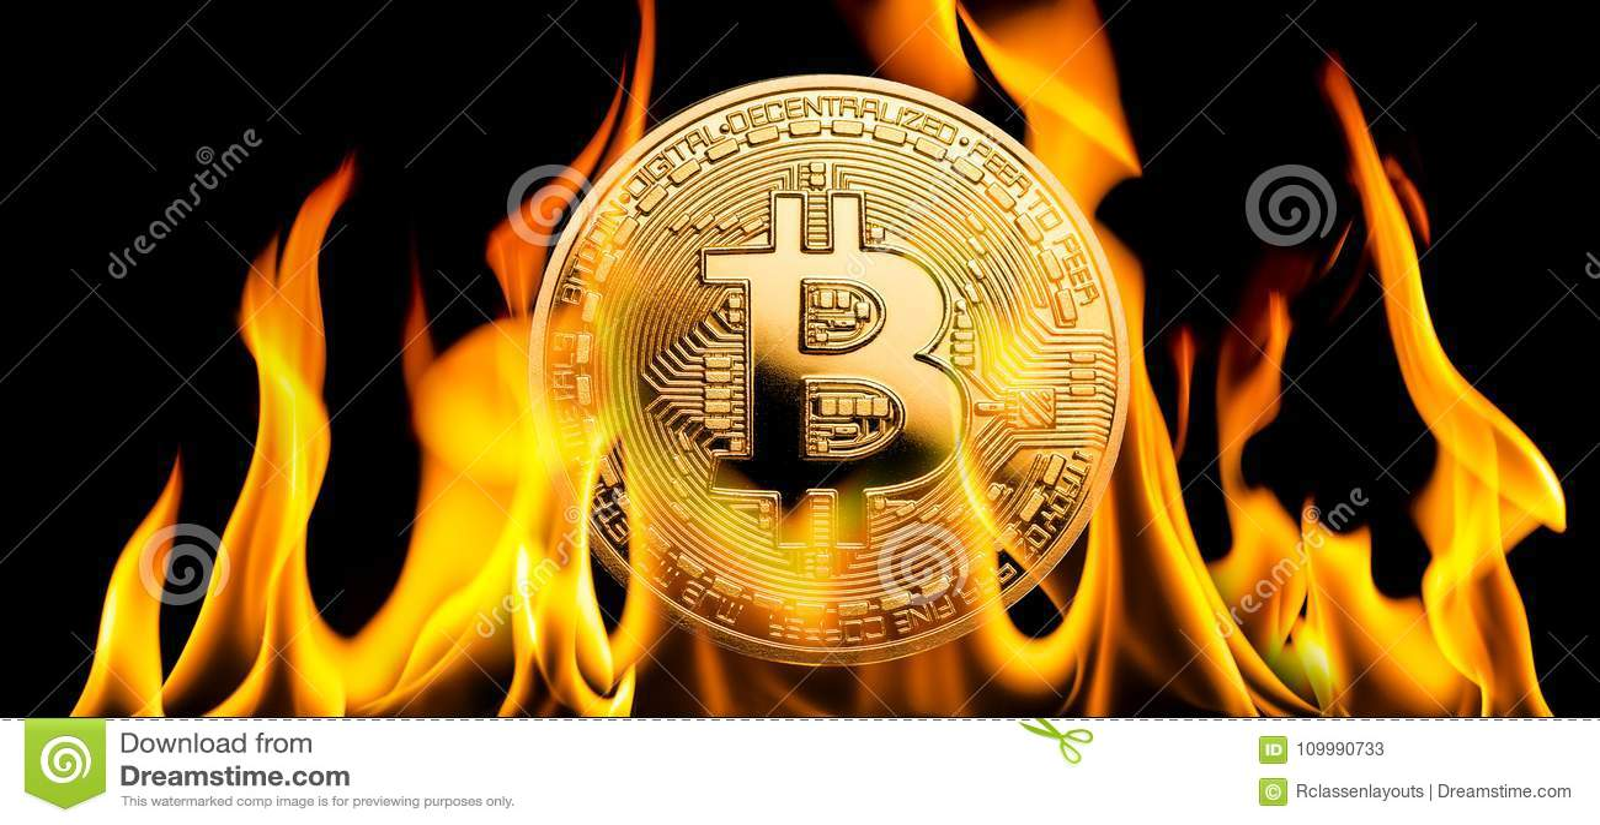 Bitcoin - κάψιμο χρημάτων cryptocurrency BTC στις φλόγες